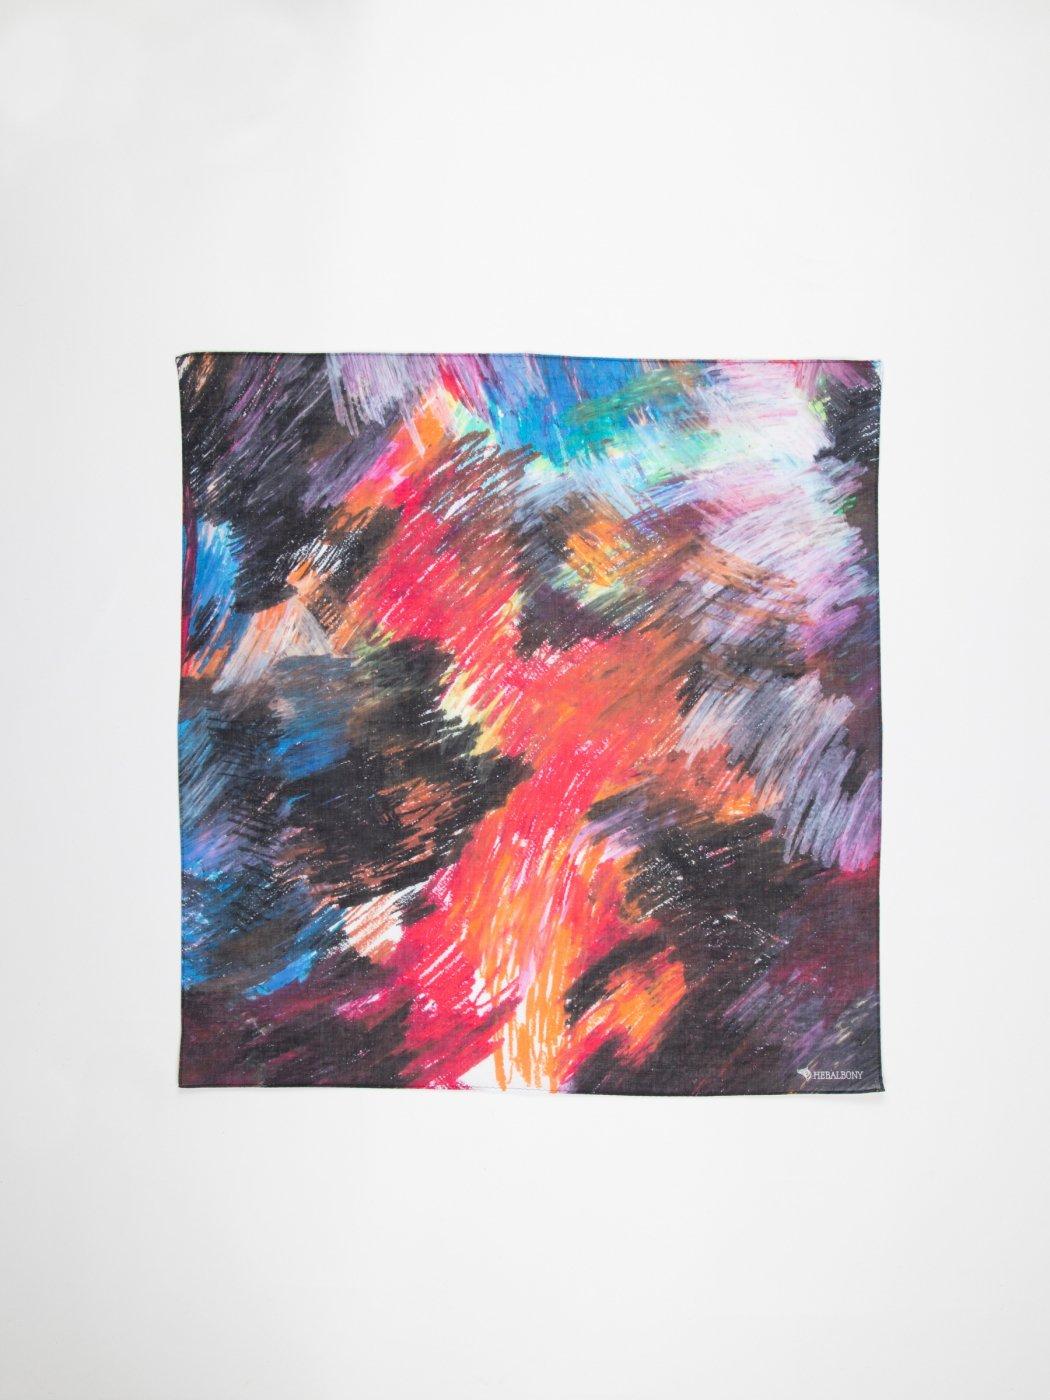 HERALBONY -ART HANDKERCHIEF- Minami Takahashi -NO TITLE-